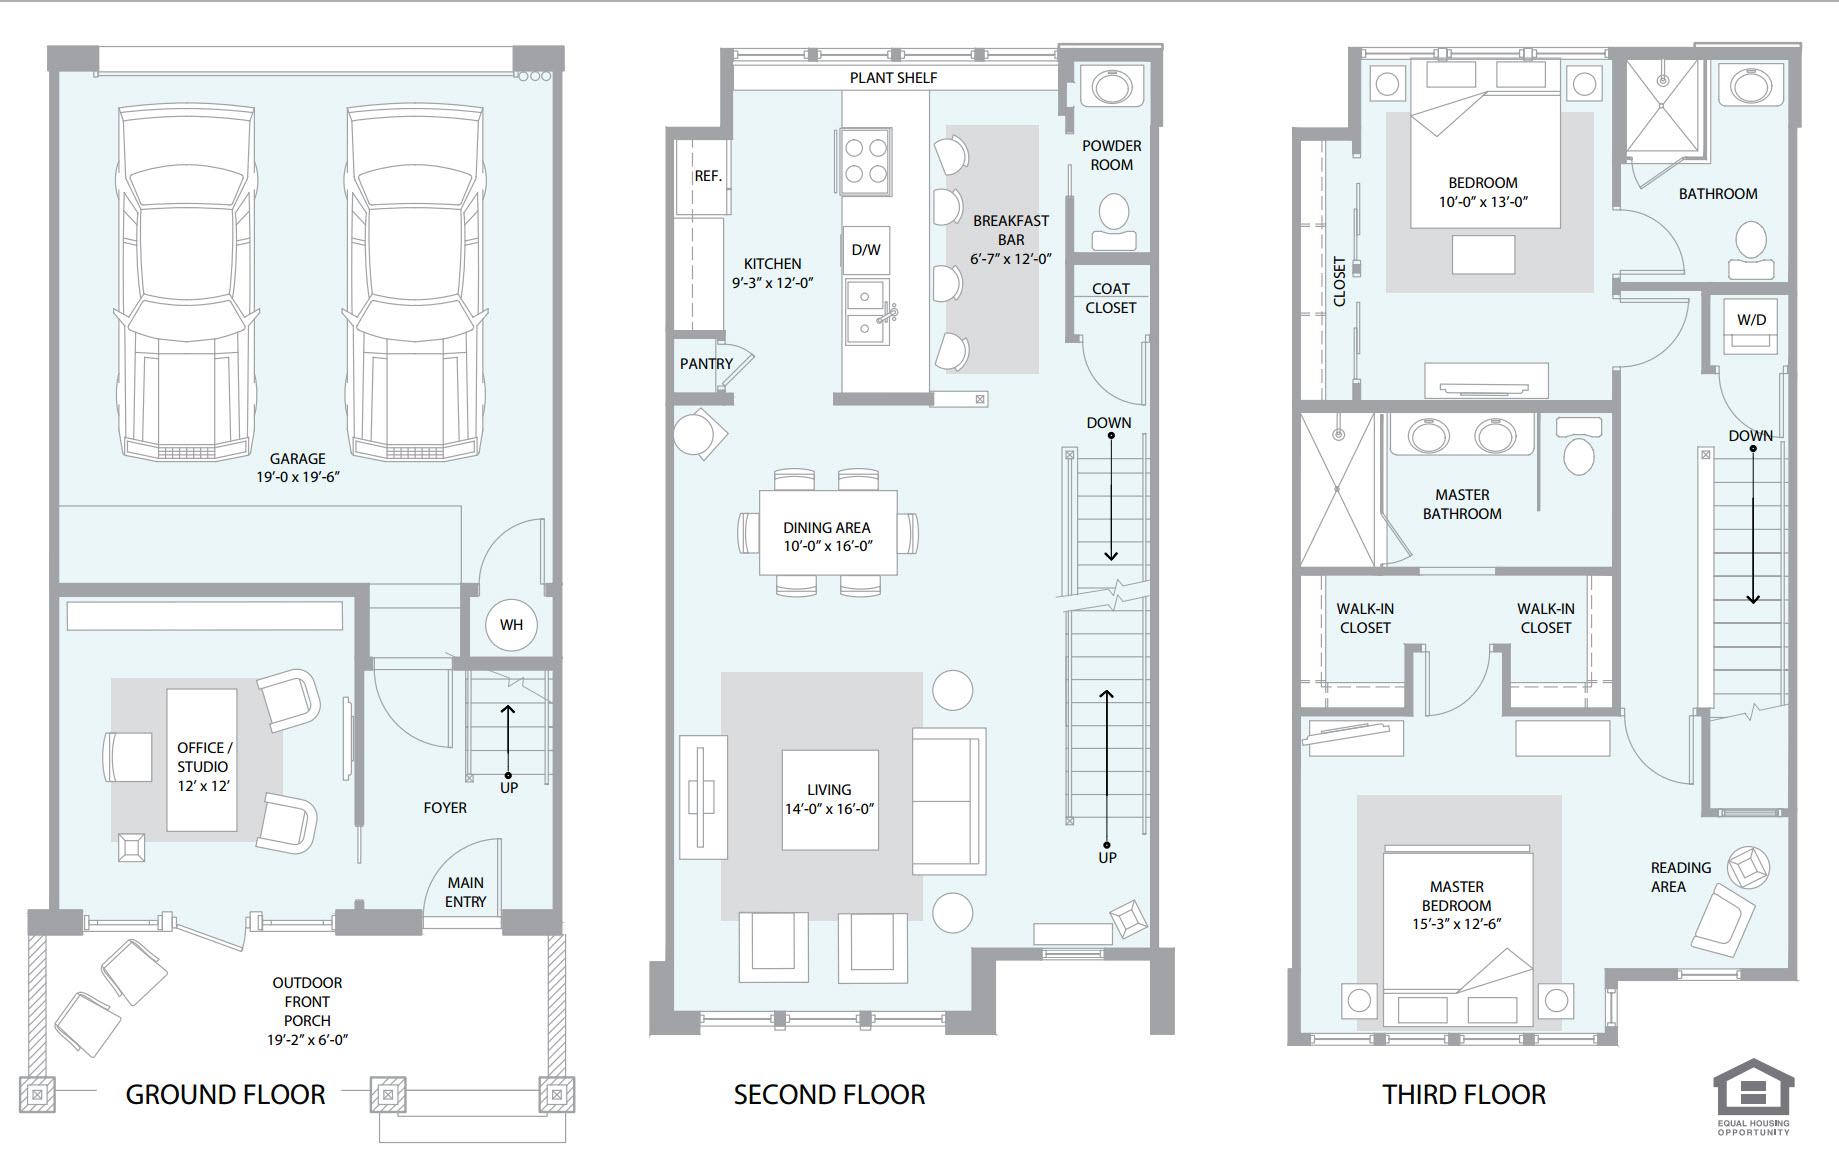 Townhomes on 3rd floorplan